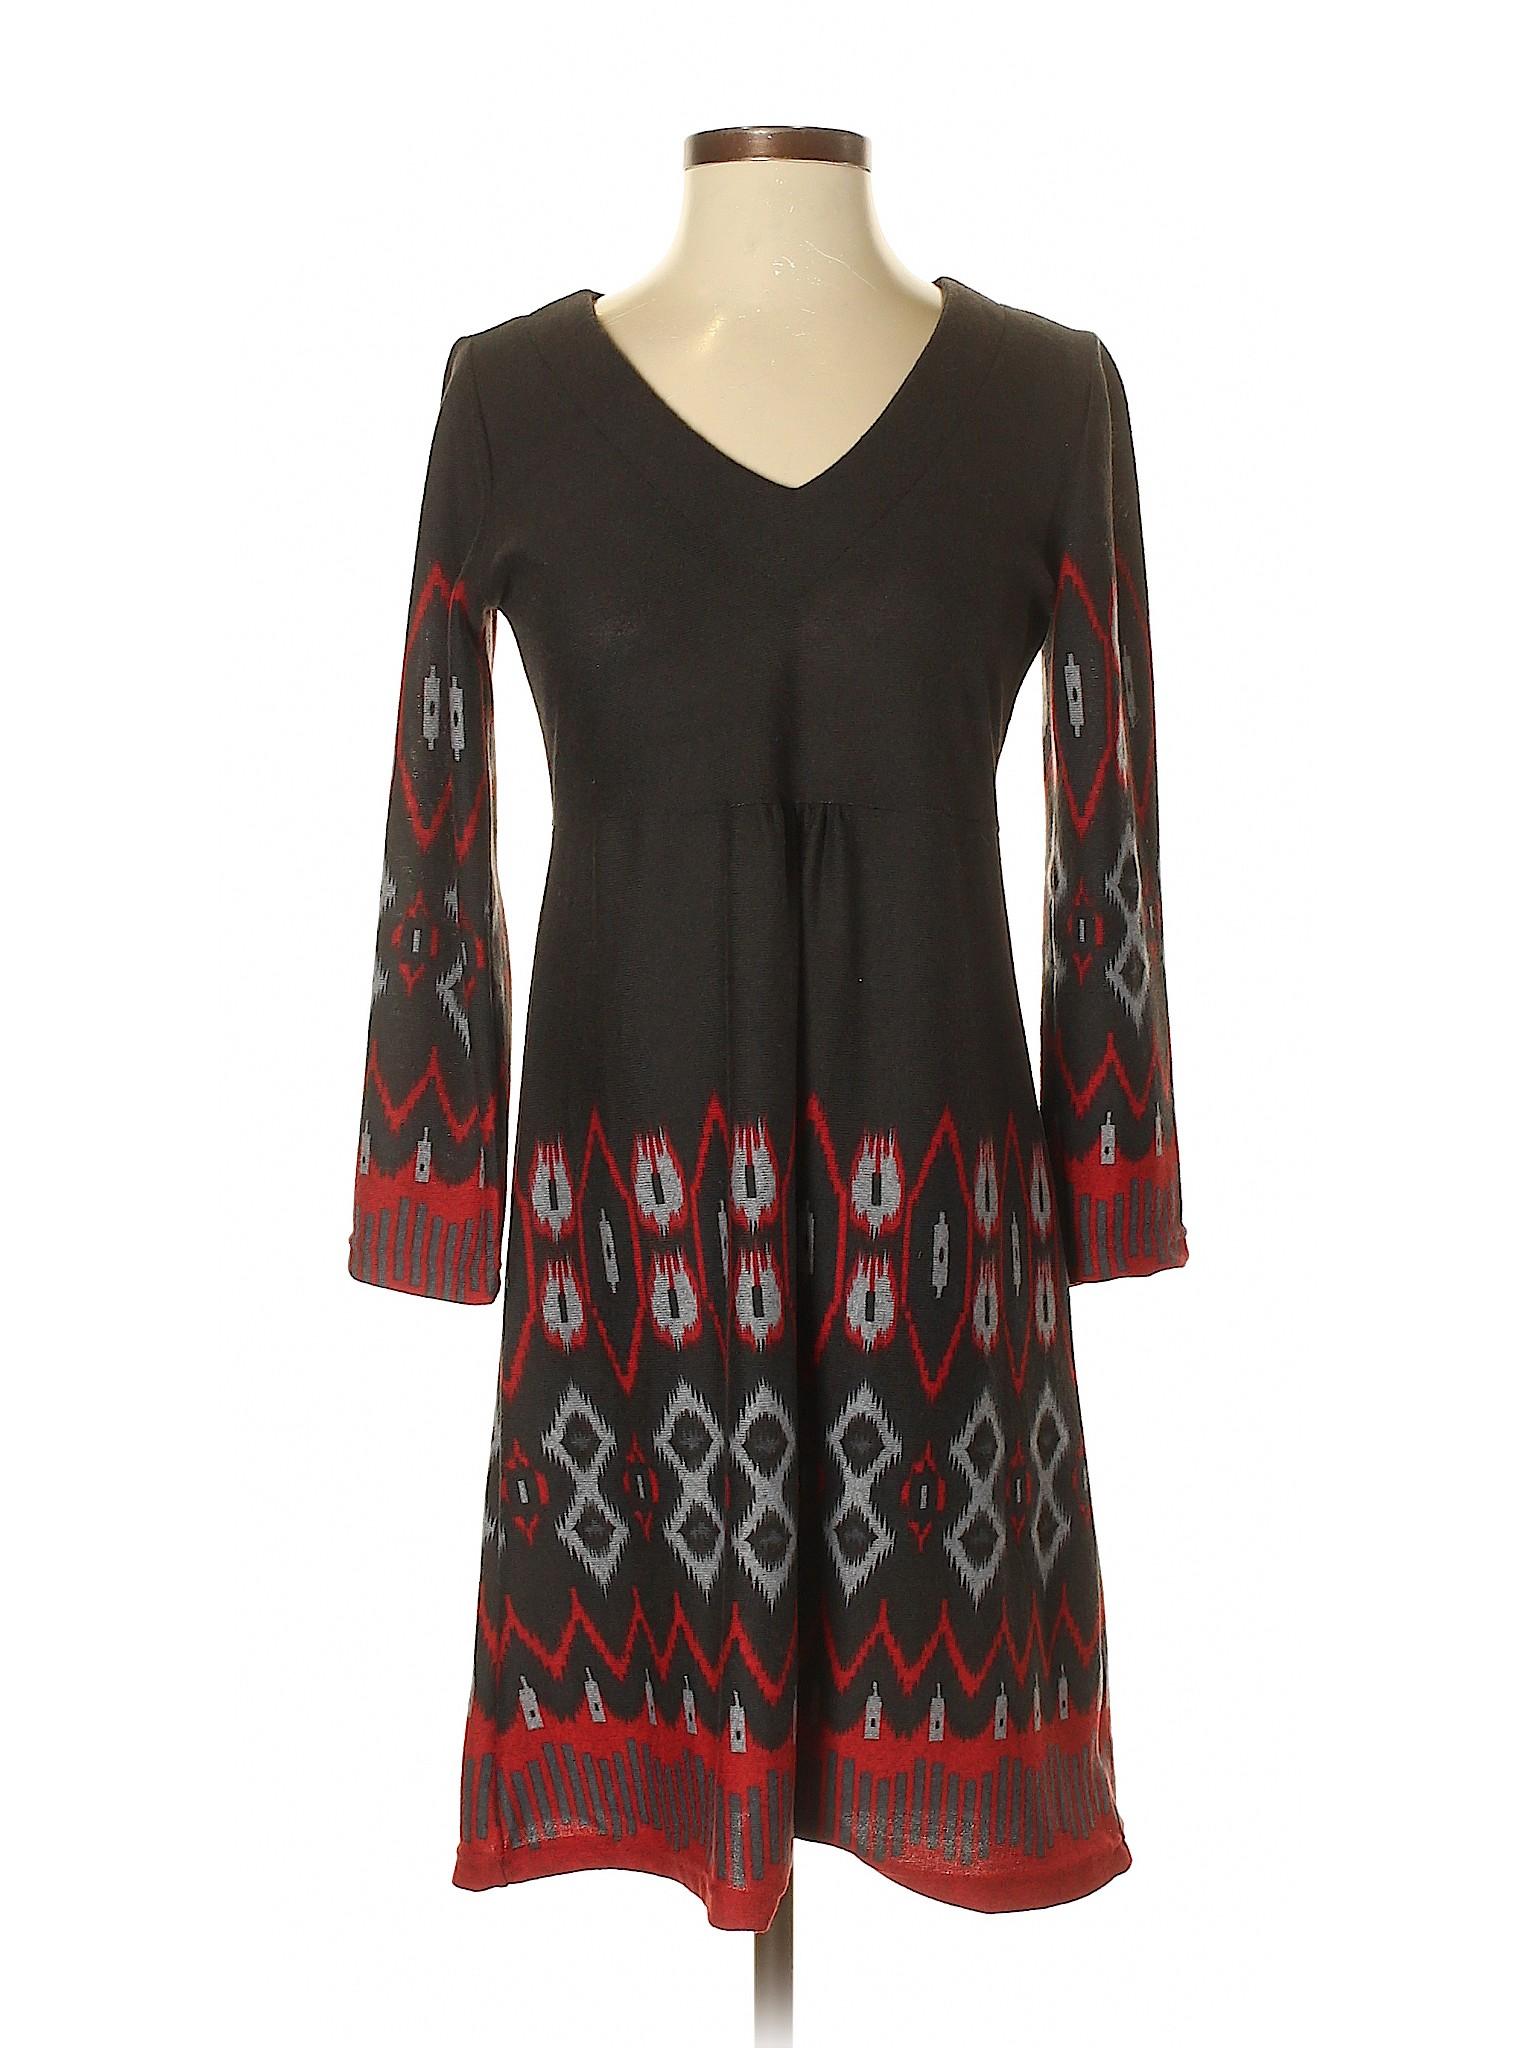 deb6d739e9fc Earthbound Trading Co. Women Black Casual Dress Sm | eBay